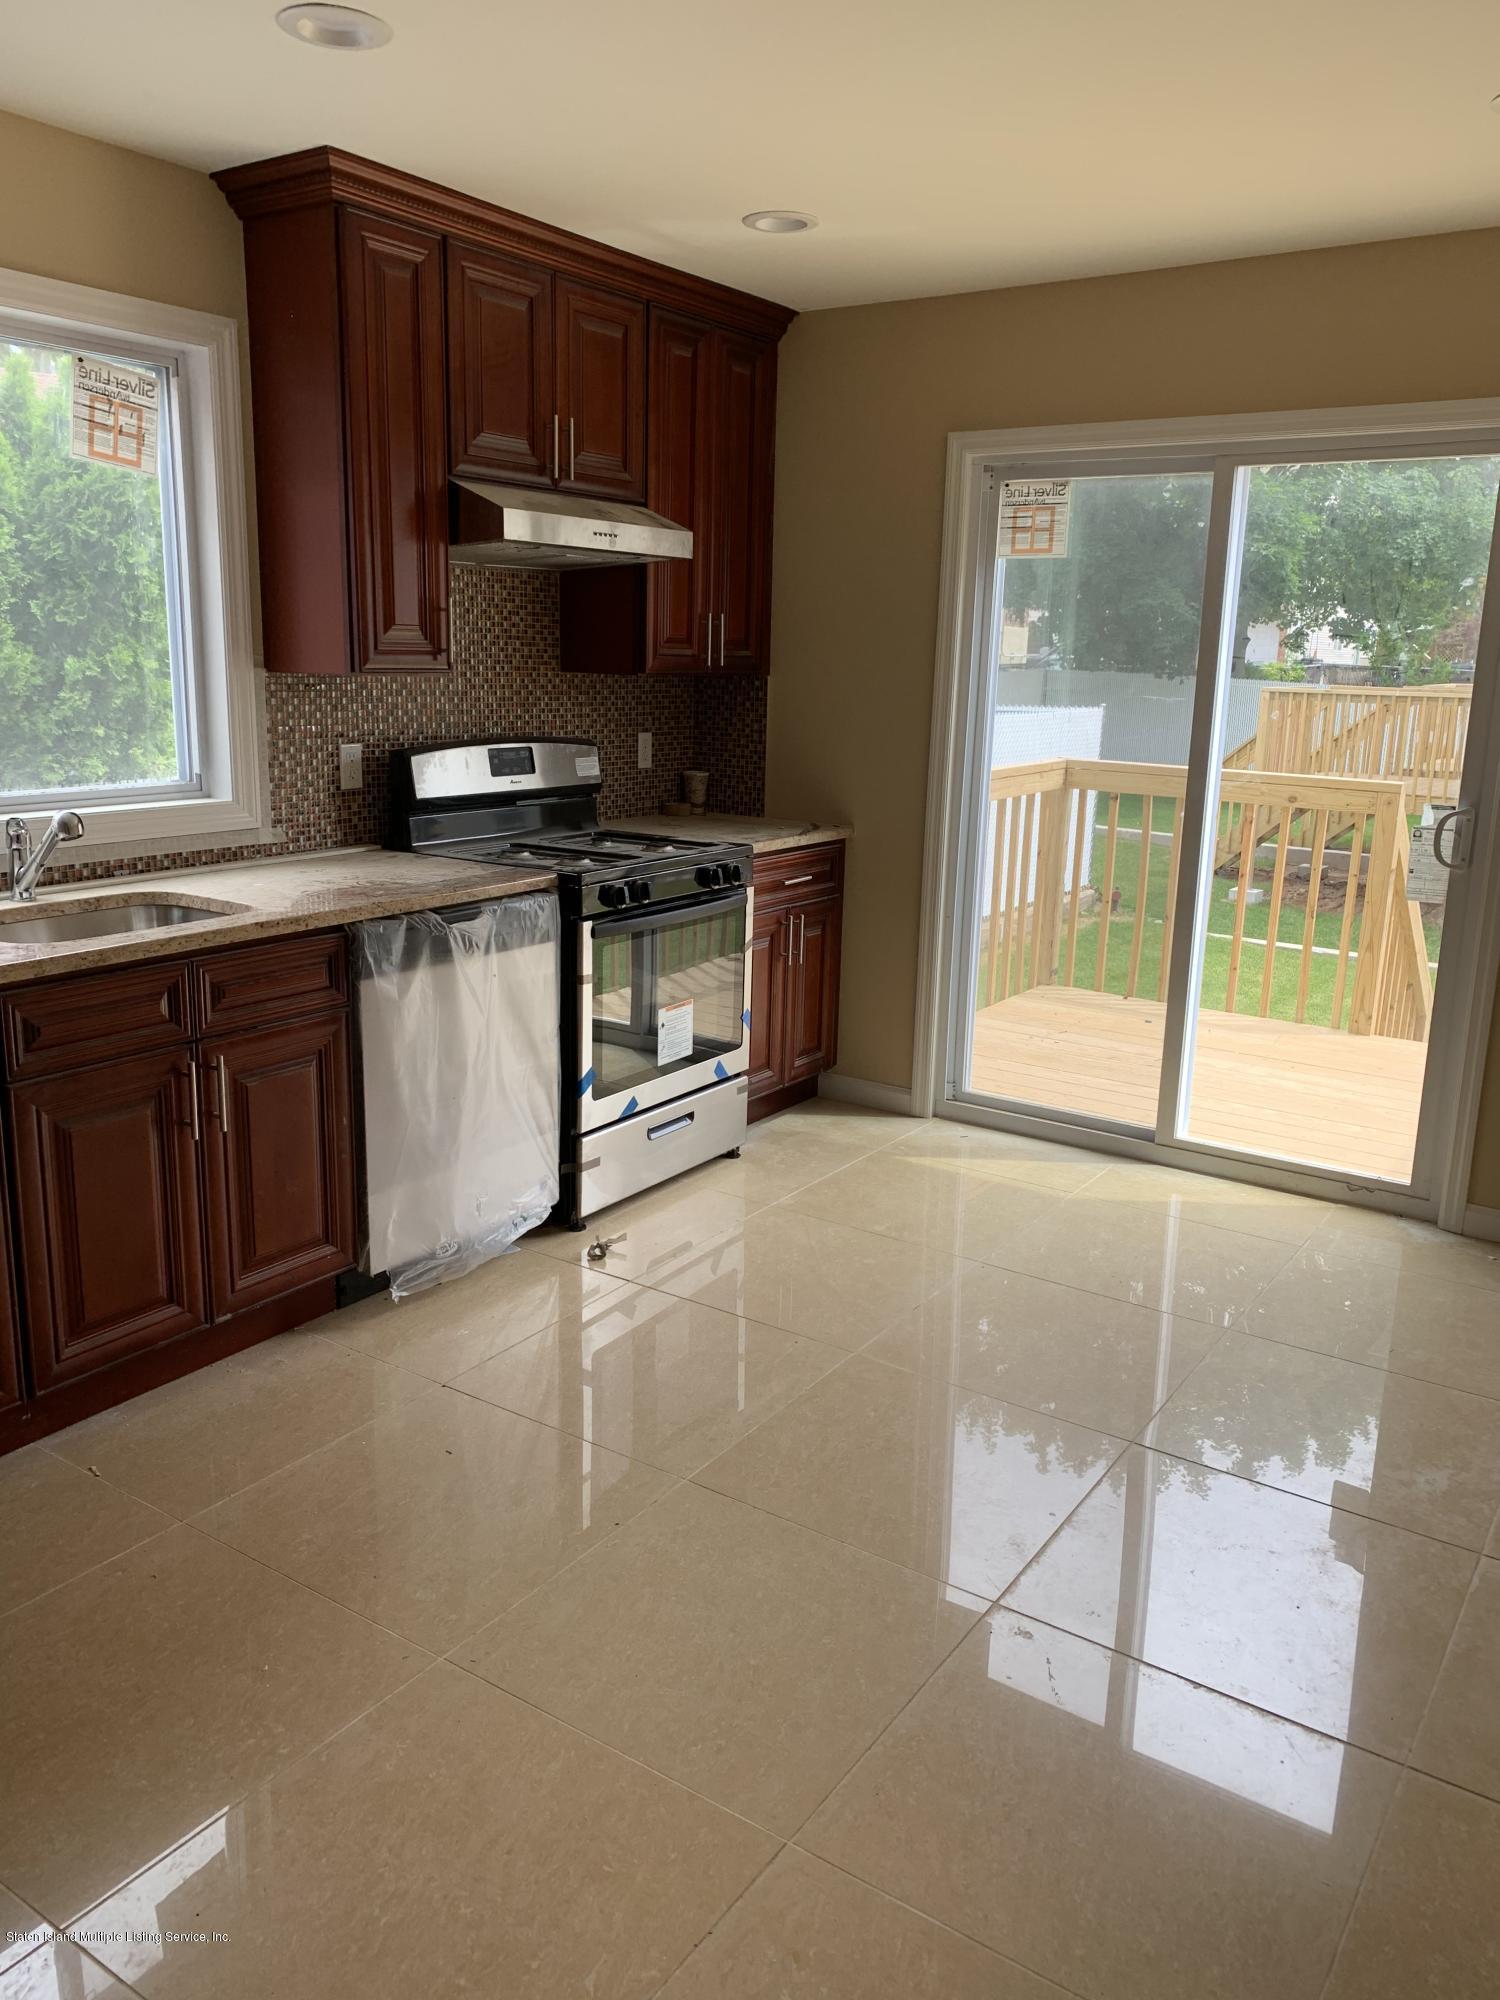 Single Family - Semi-Attached 165 Sand Lane  Staten Island, NY 10305, MLS-1125316-5